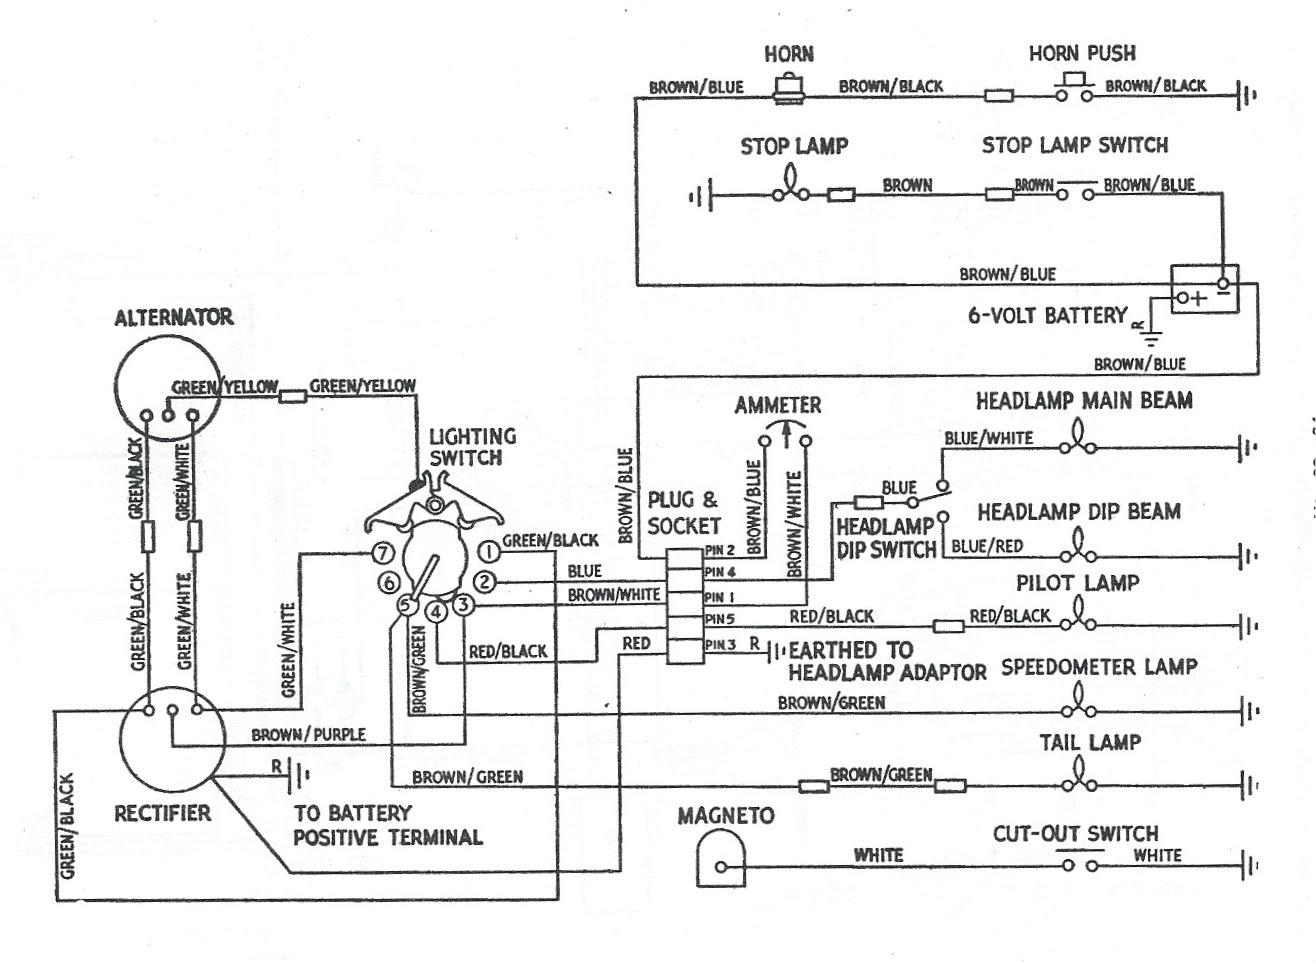 Diagram Download Triumph Tr6 1970 Motorcycle Wiring Diagram Full Hd Version Diagramcable Freiheitfuermumia De